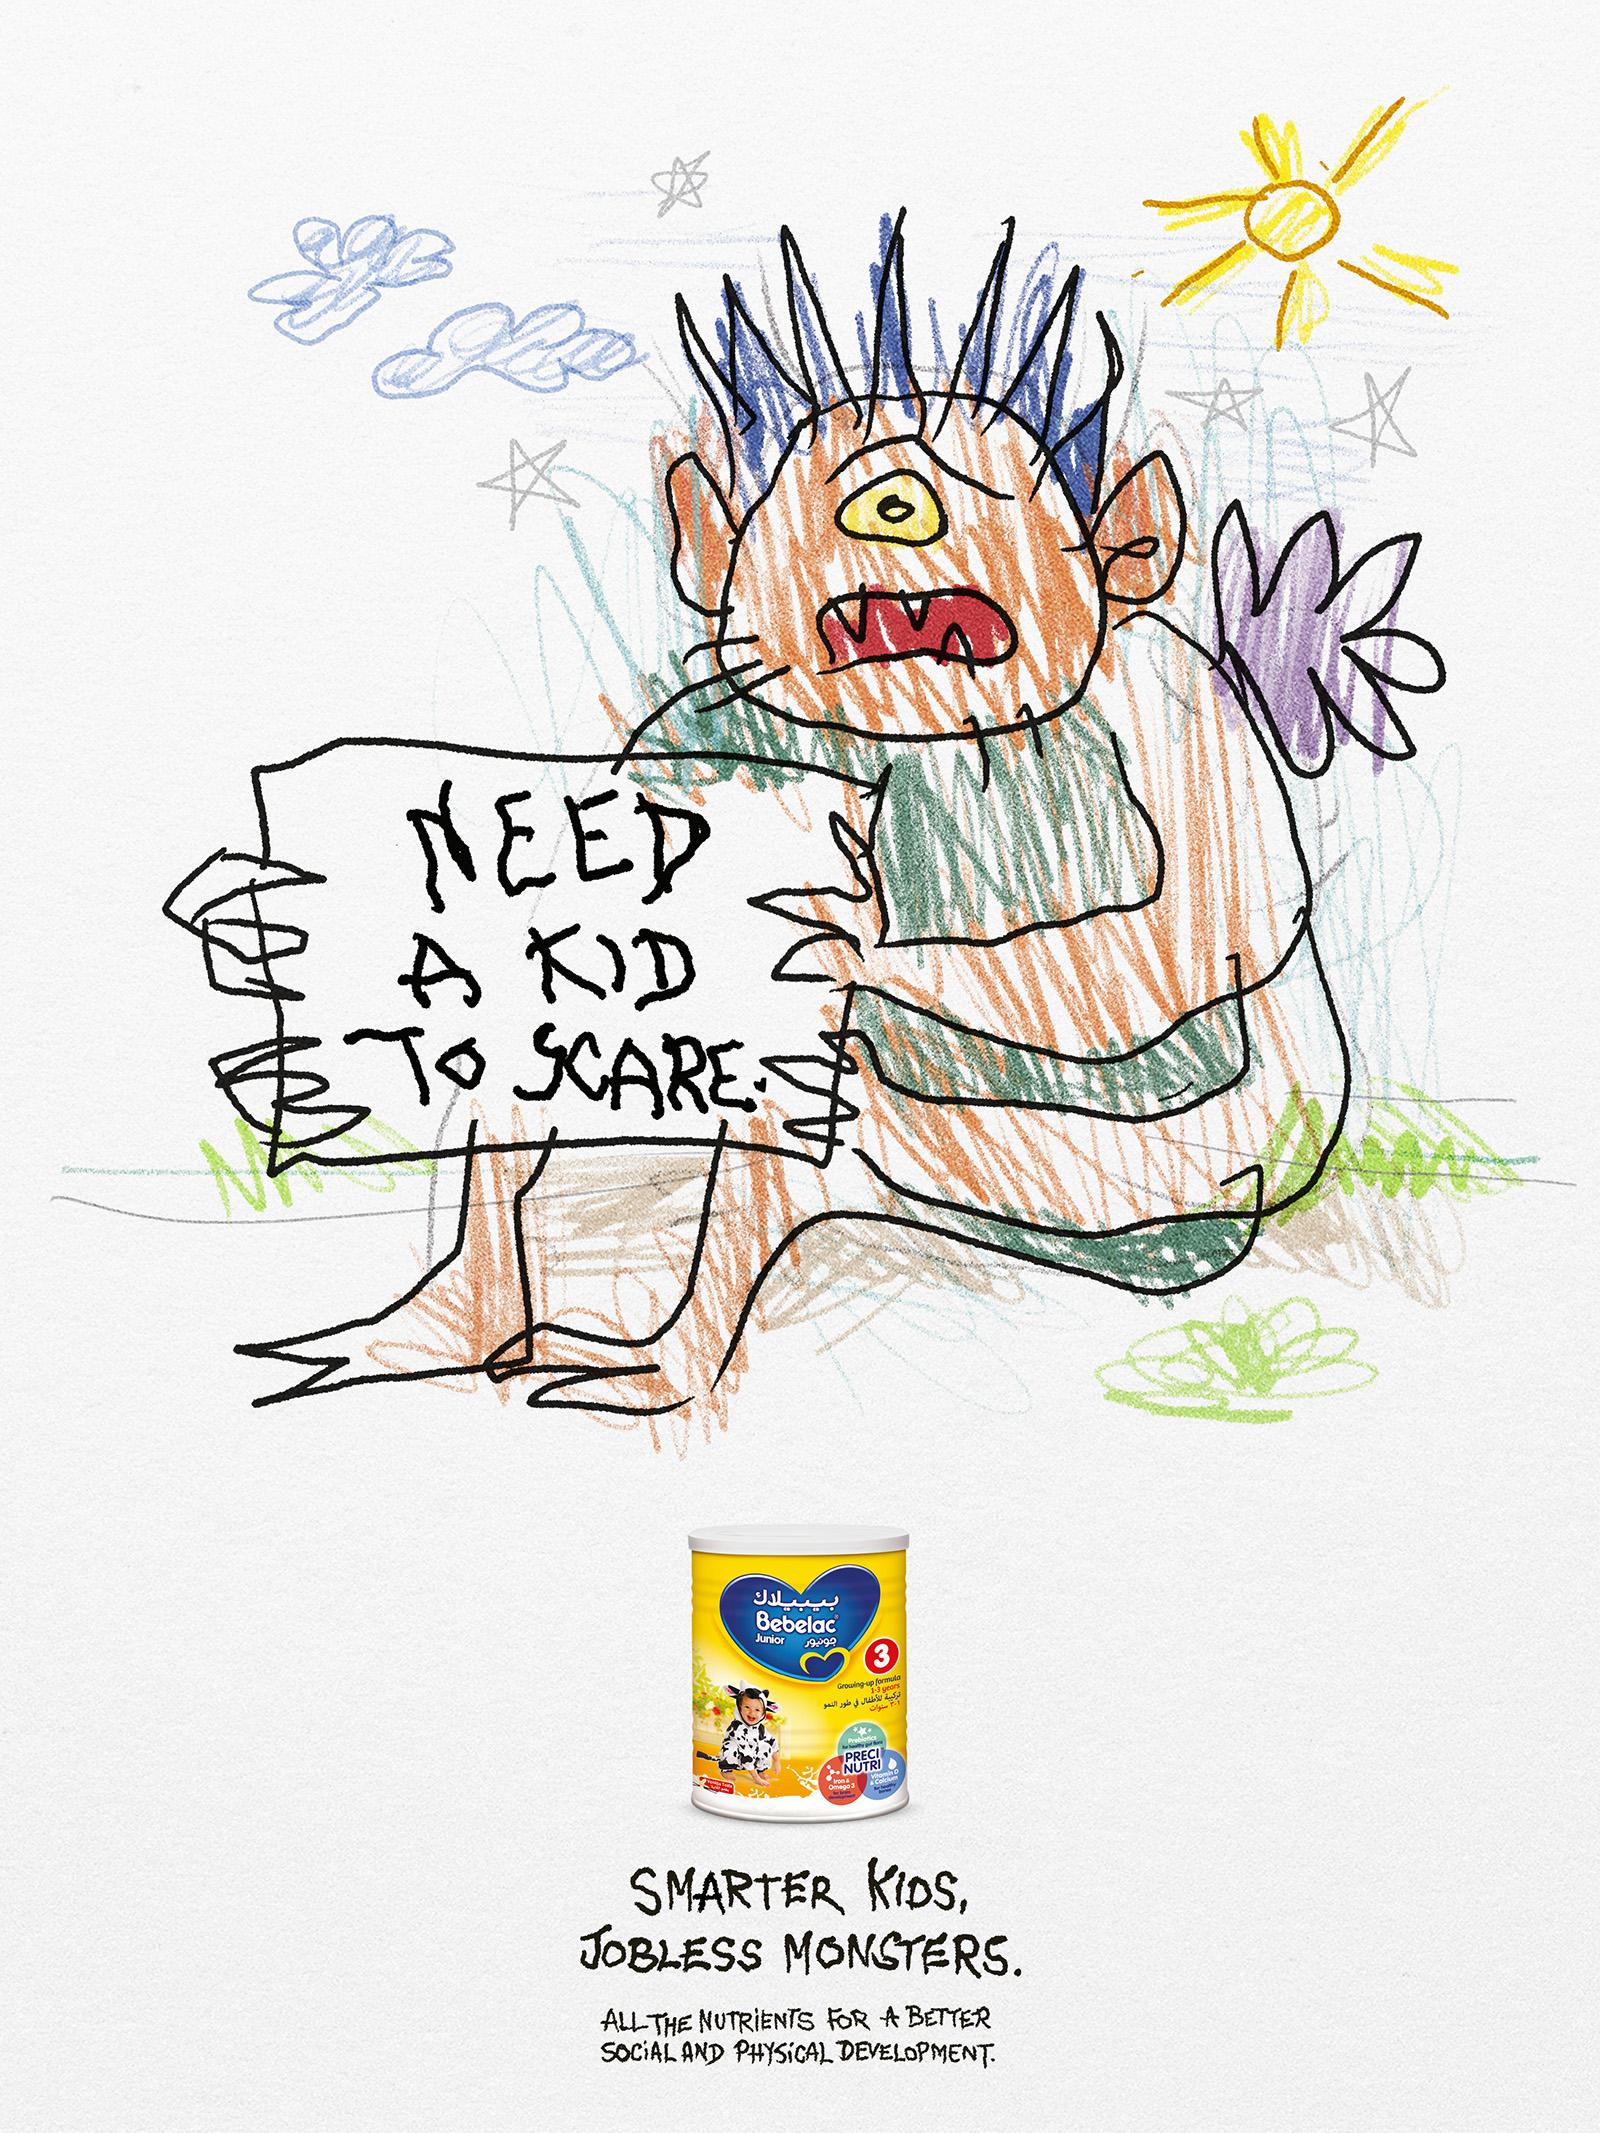 Bebelac Jobless Monsters